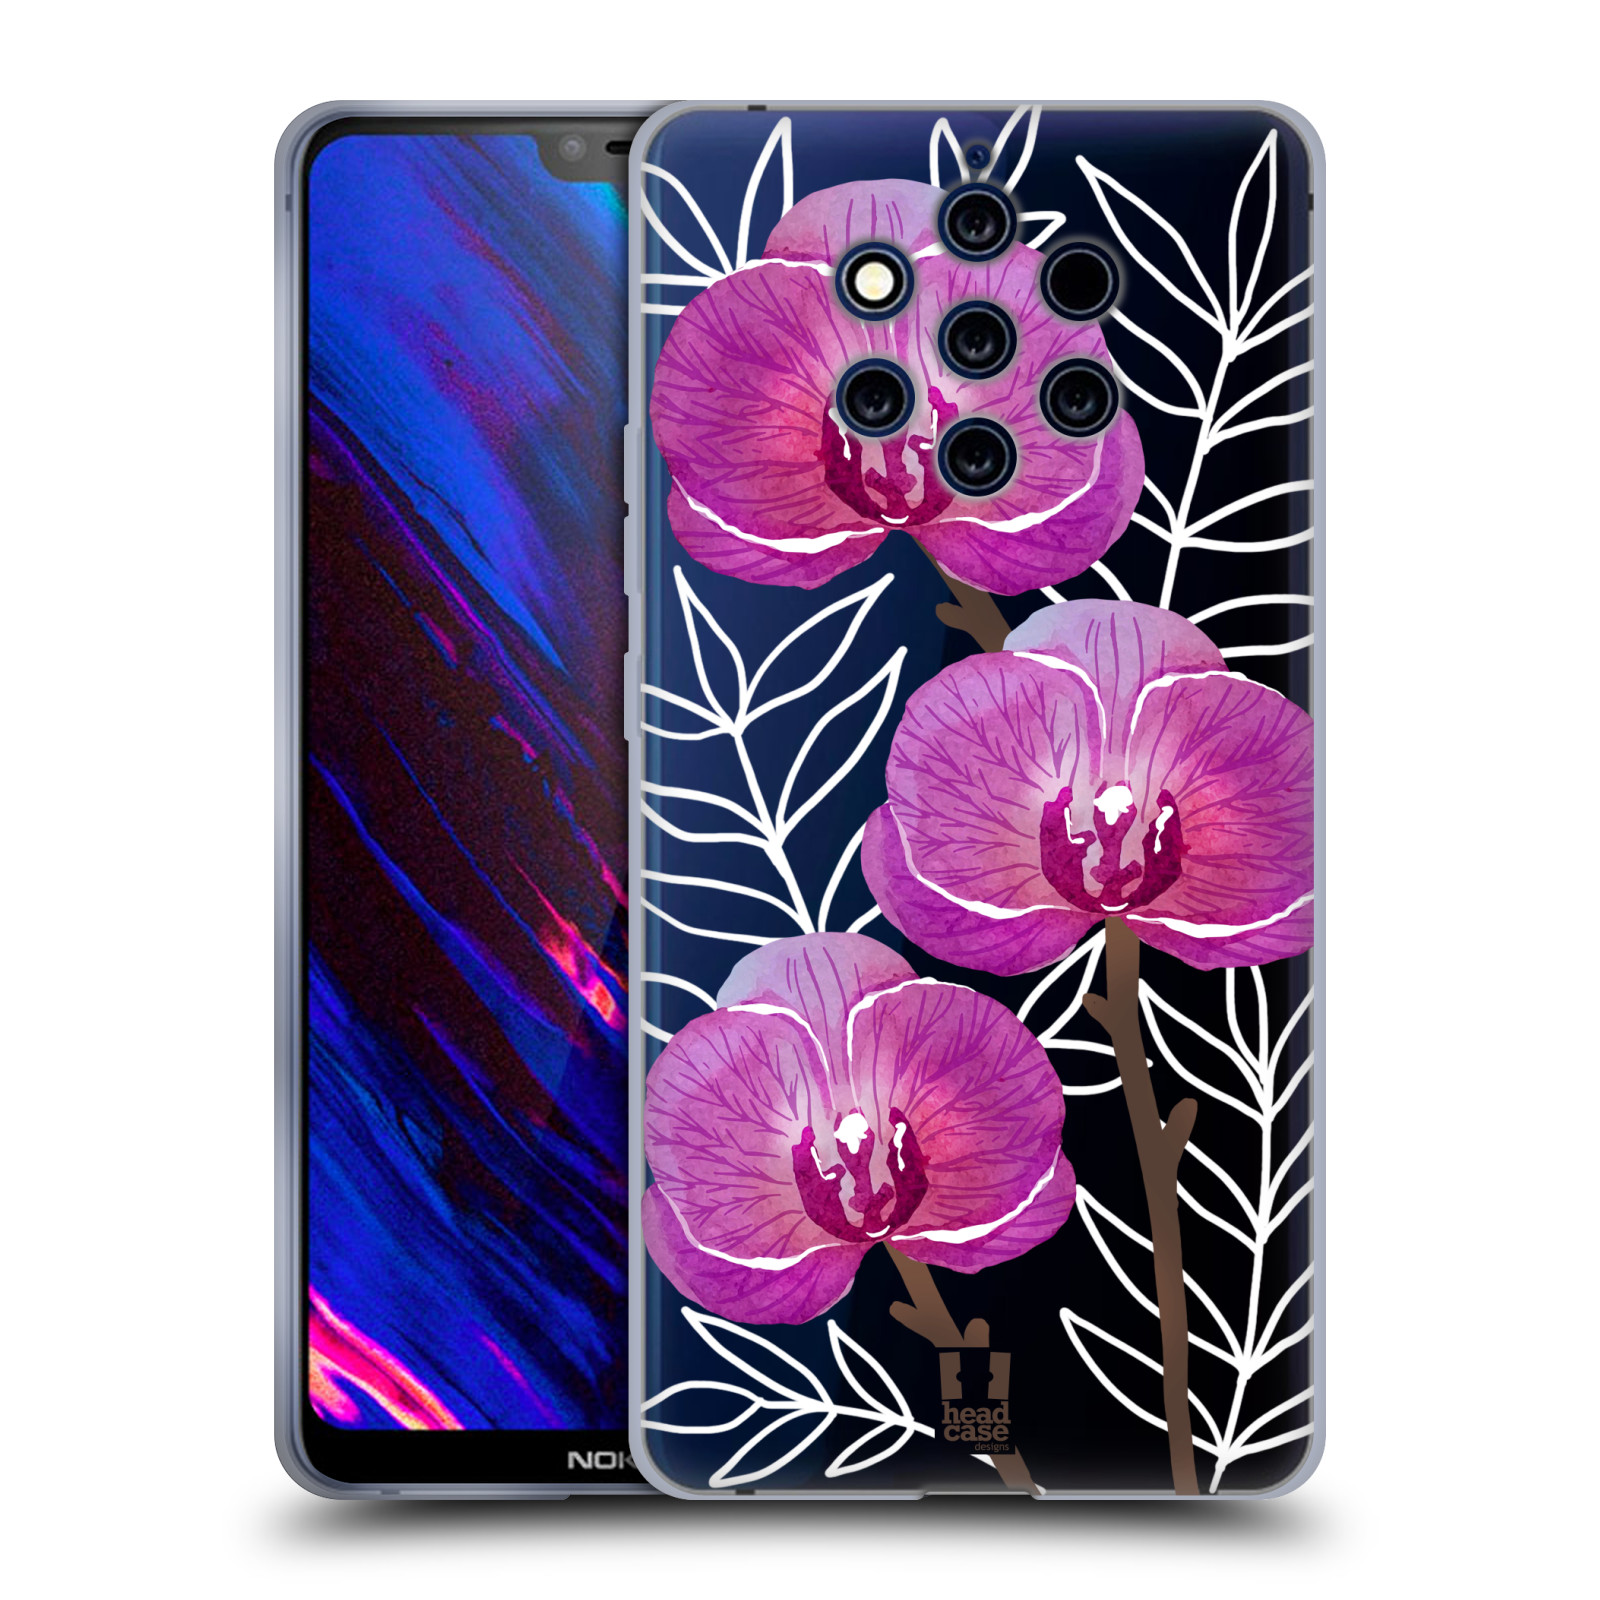 Silikonové pouzdro na mobil Nokia 9 PureView - Head Case - Hezoučké kvítky - průhledné